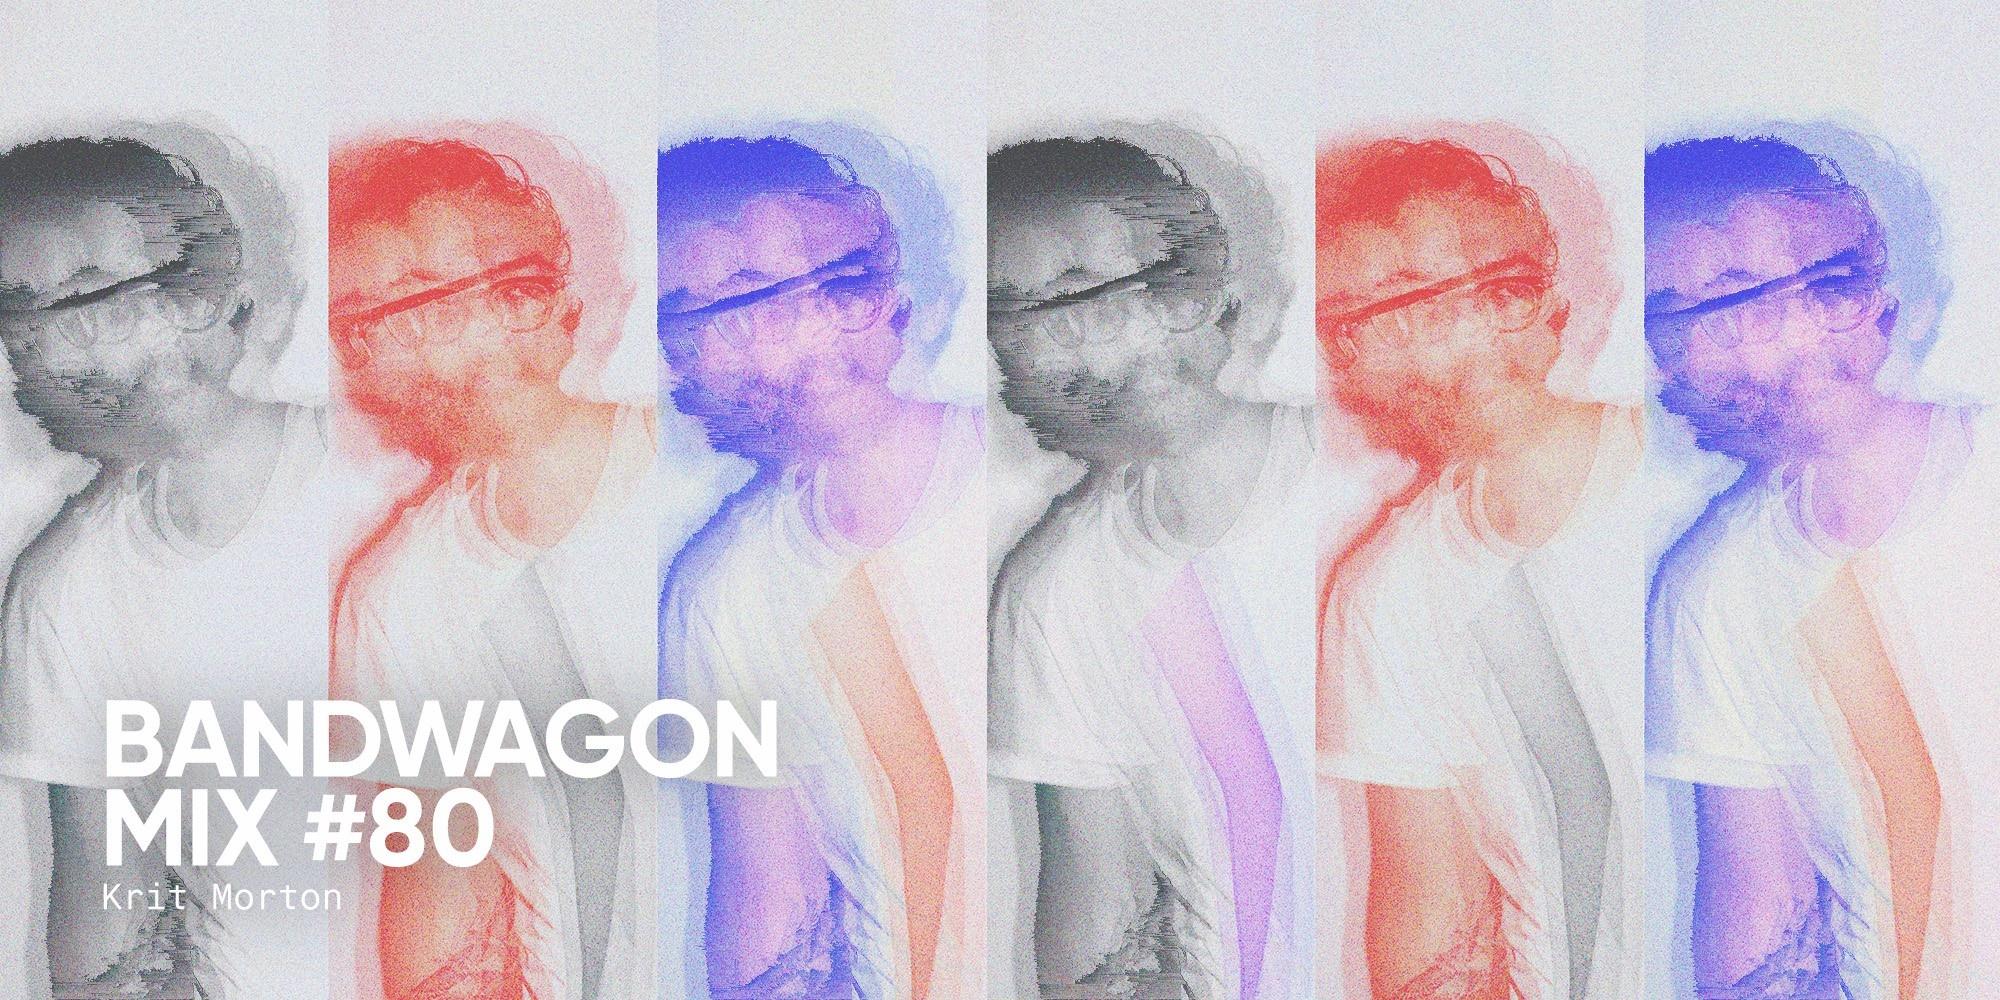 Bandwagon Mix #80: Krit Morton